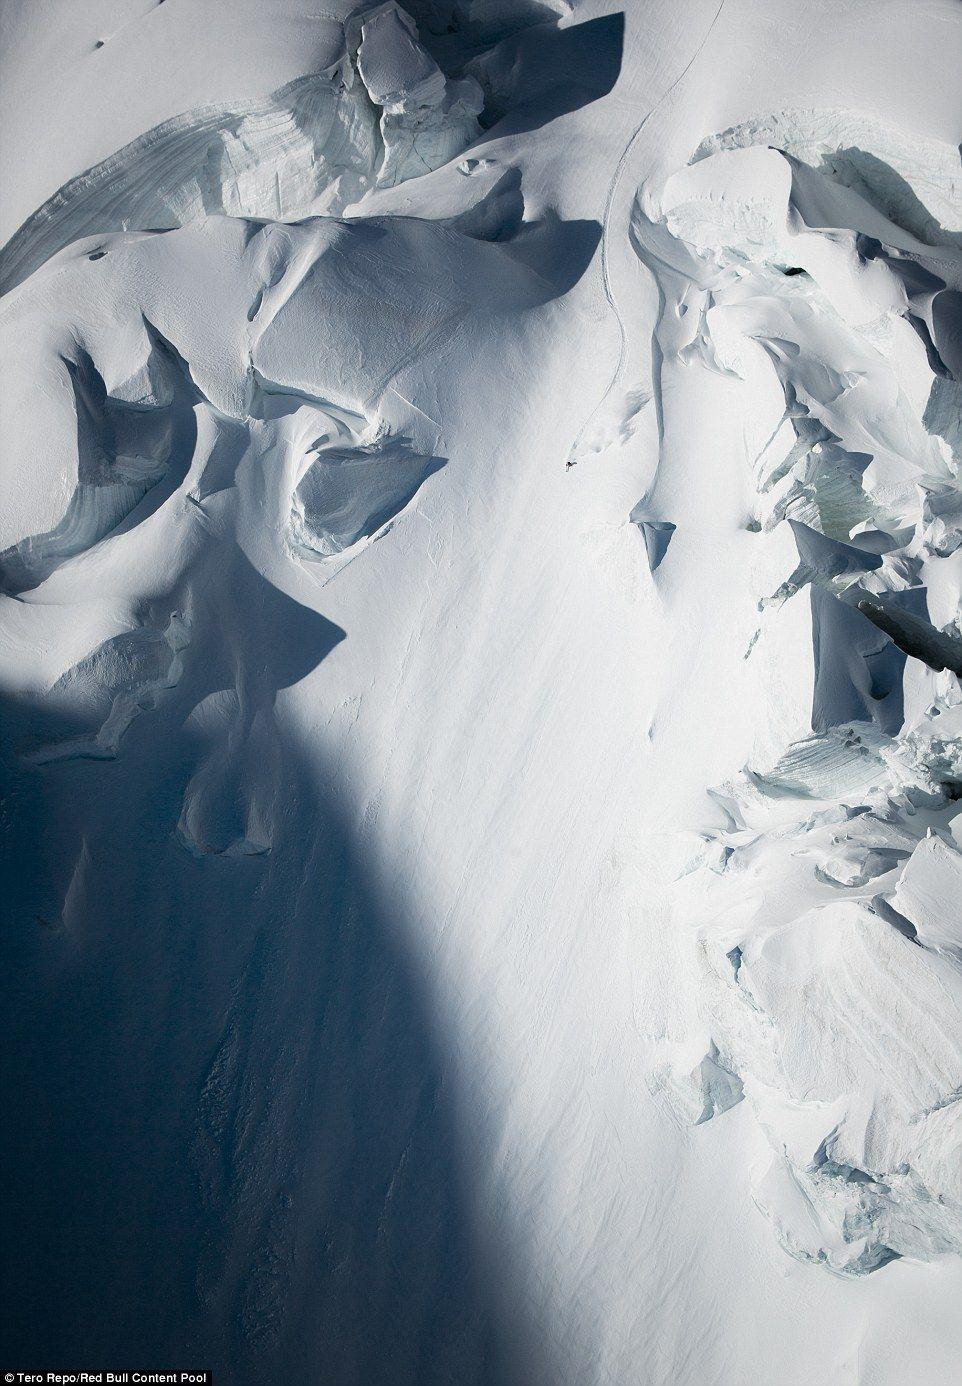 Heitz es un experimentado esquiador, empezó en esta disciplina desde que era pequeño. Foto de Red Bull Content Pool